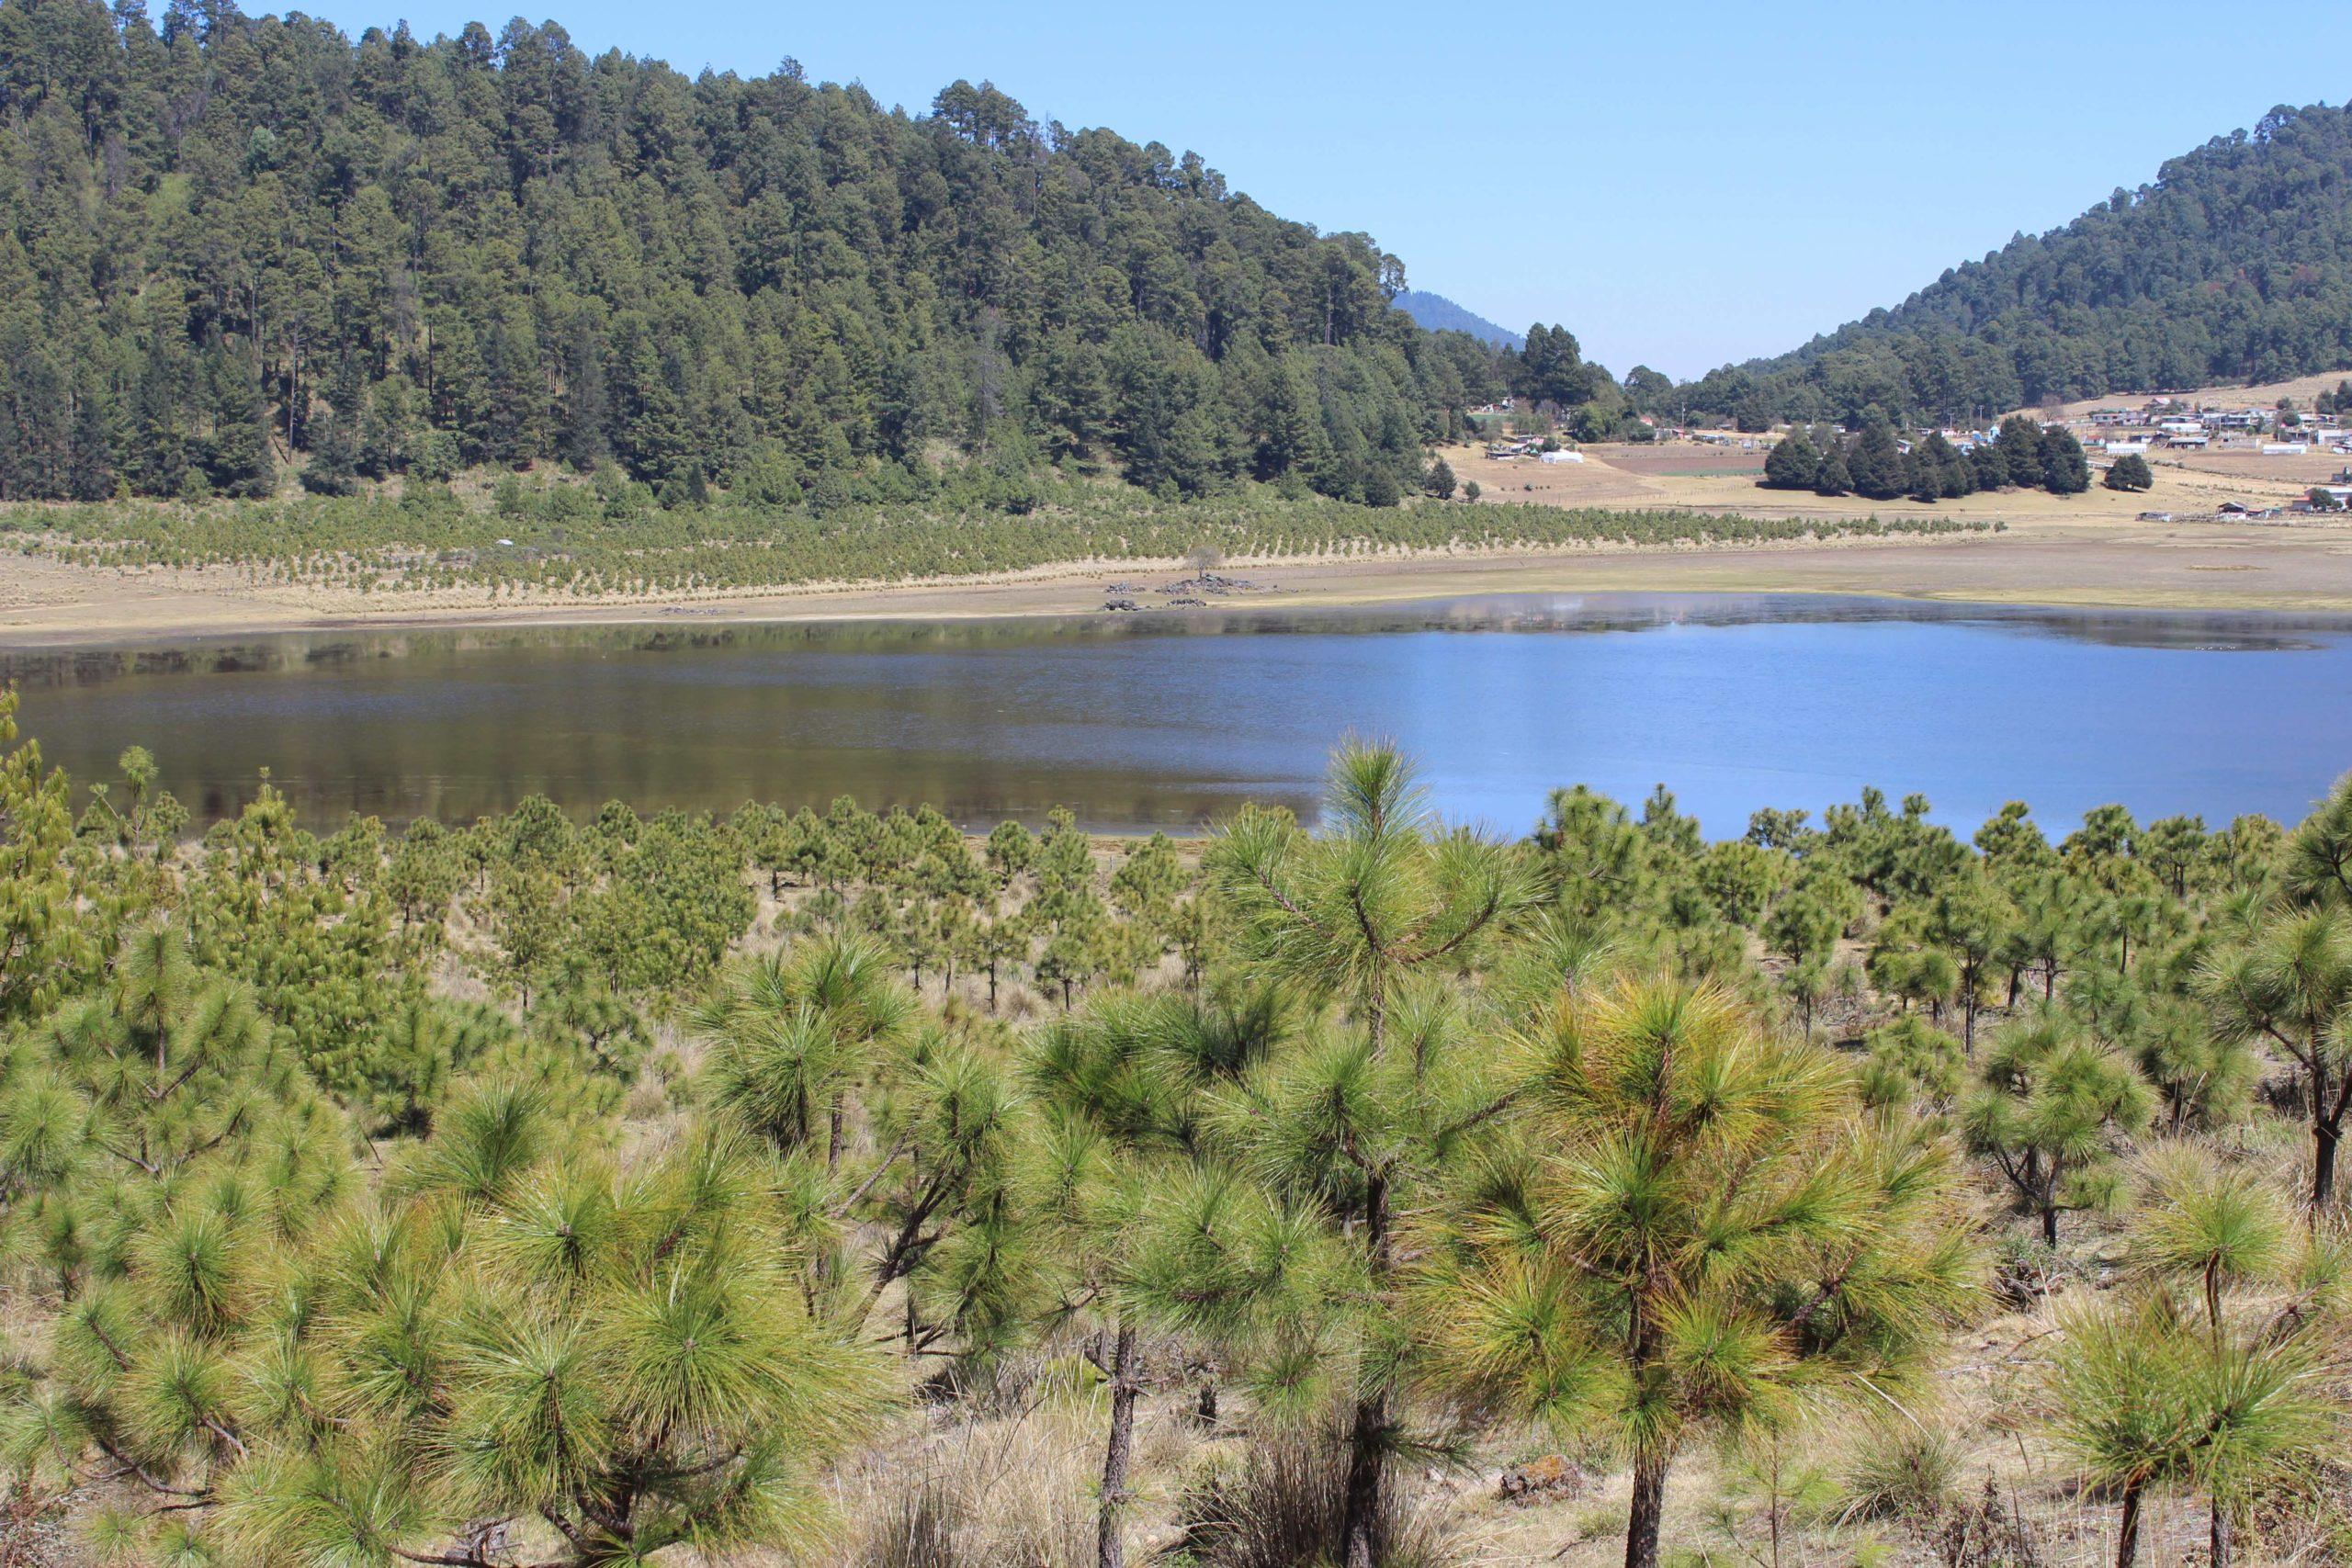 Amanalco-Edomex-manejo forestal